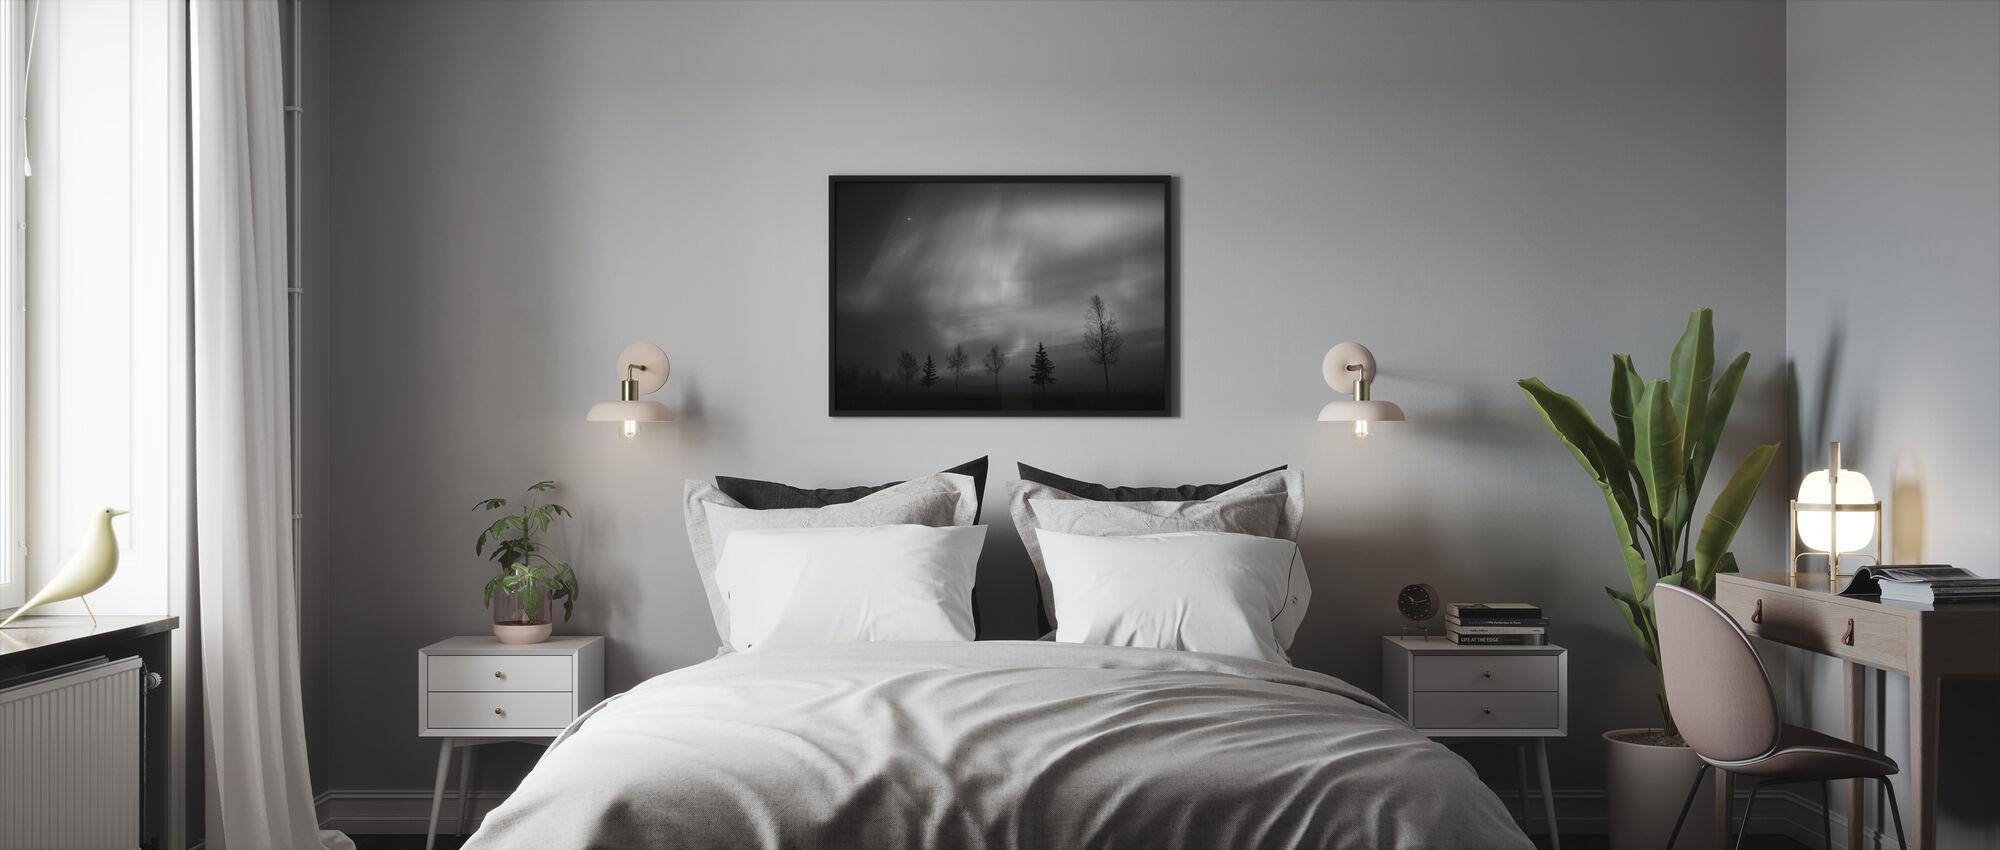 Luces Nórdicas - Print enmarcado - Dormitorio